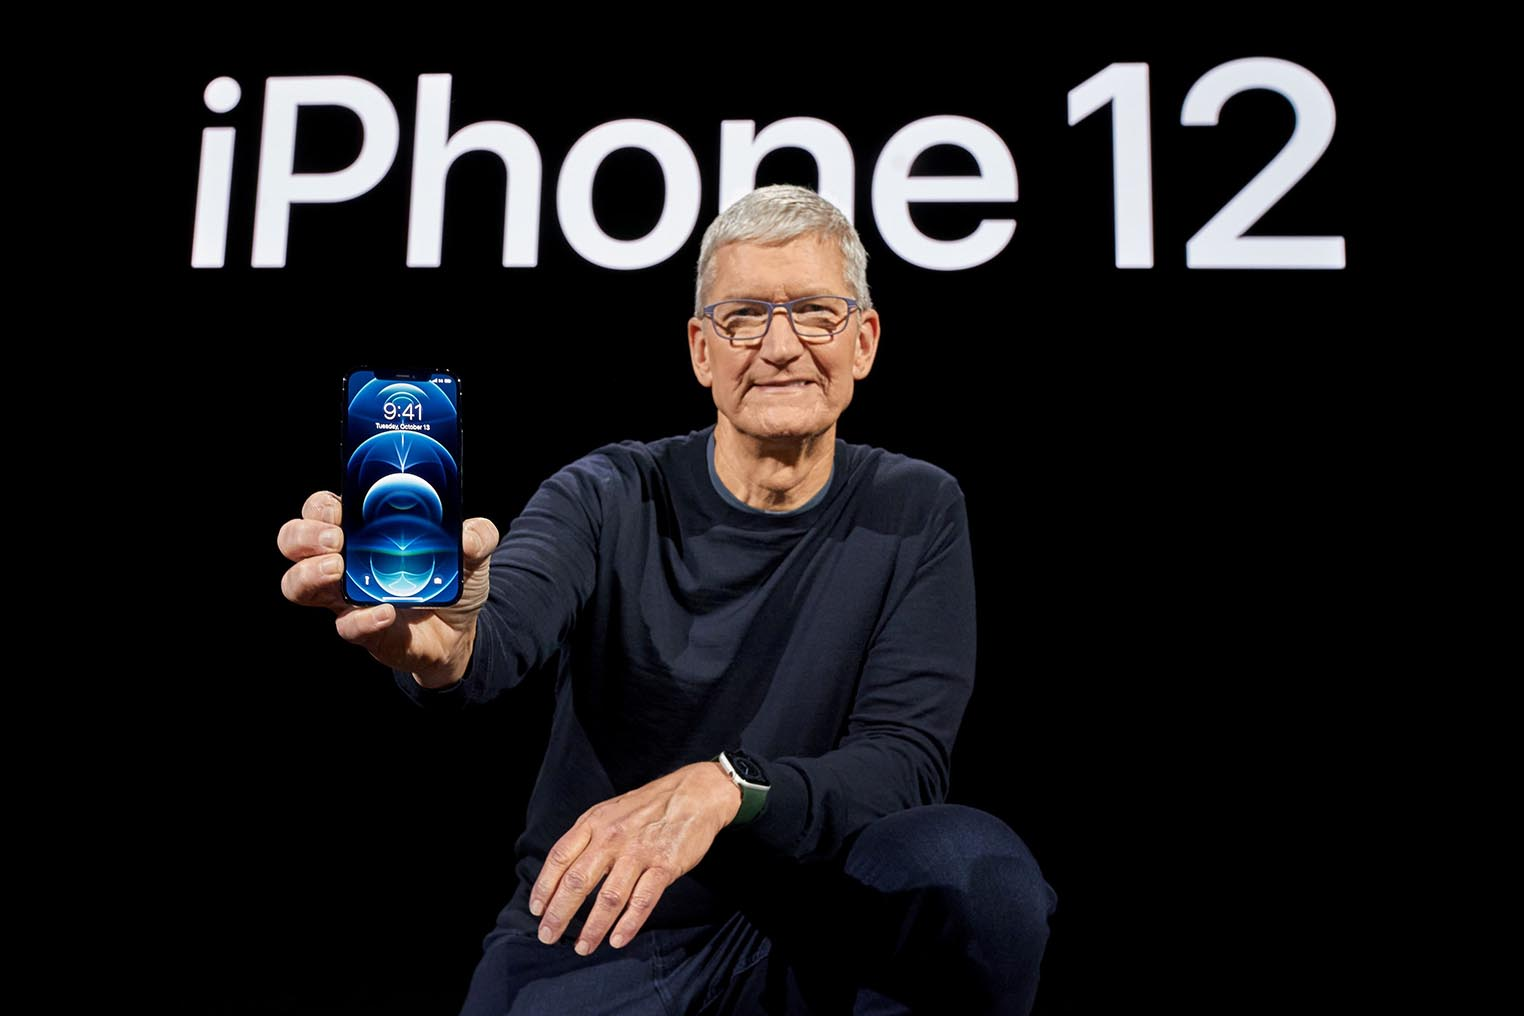 Tim Cook iPhone 12